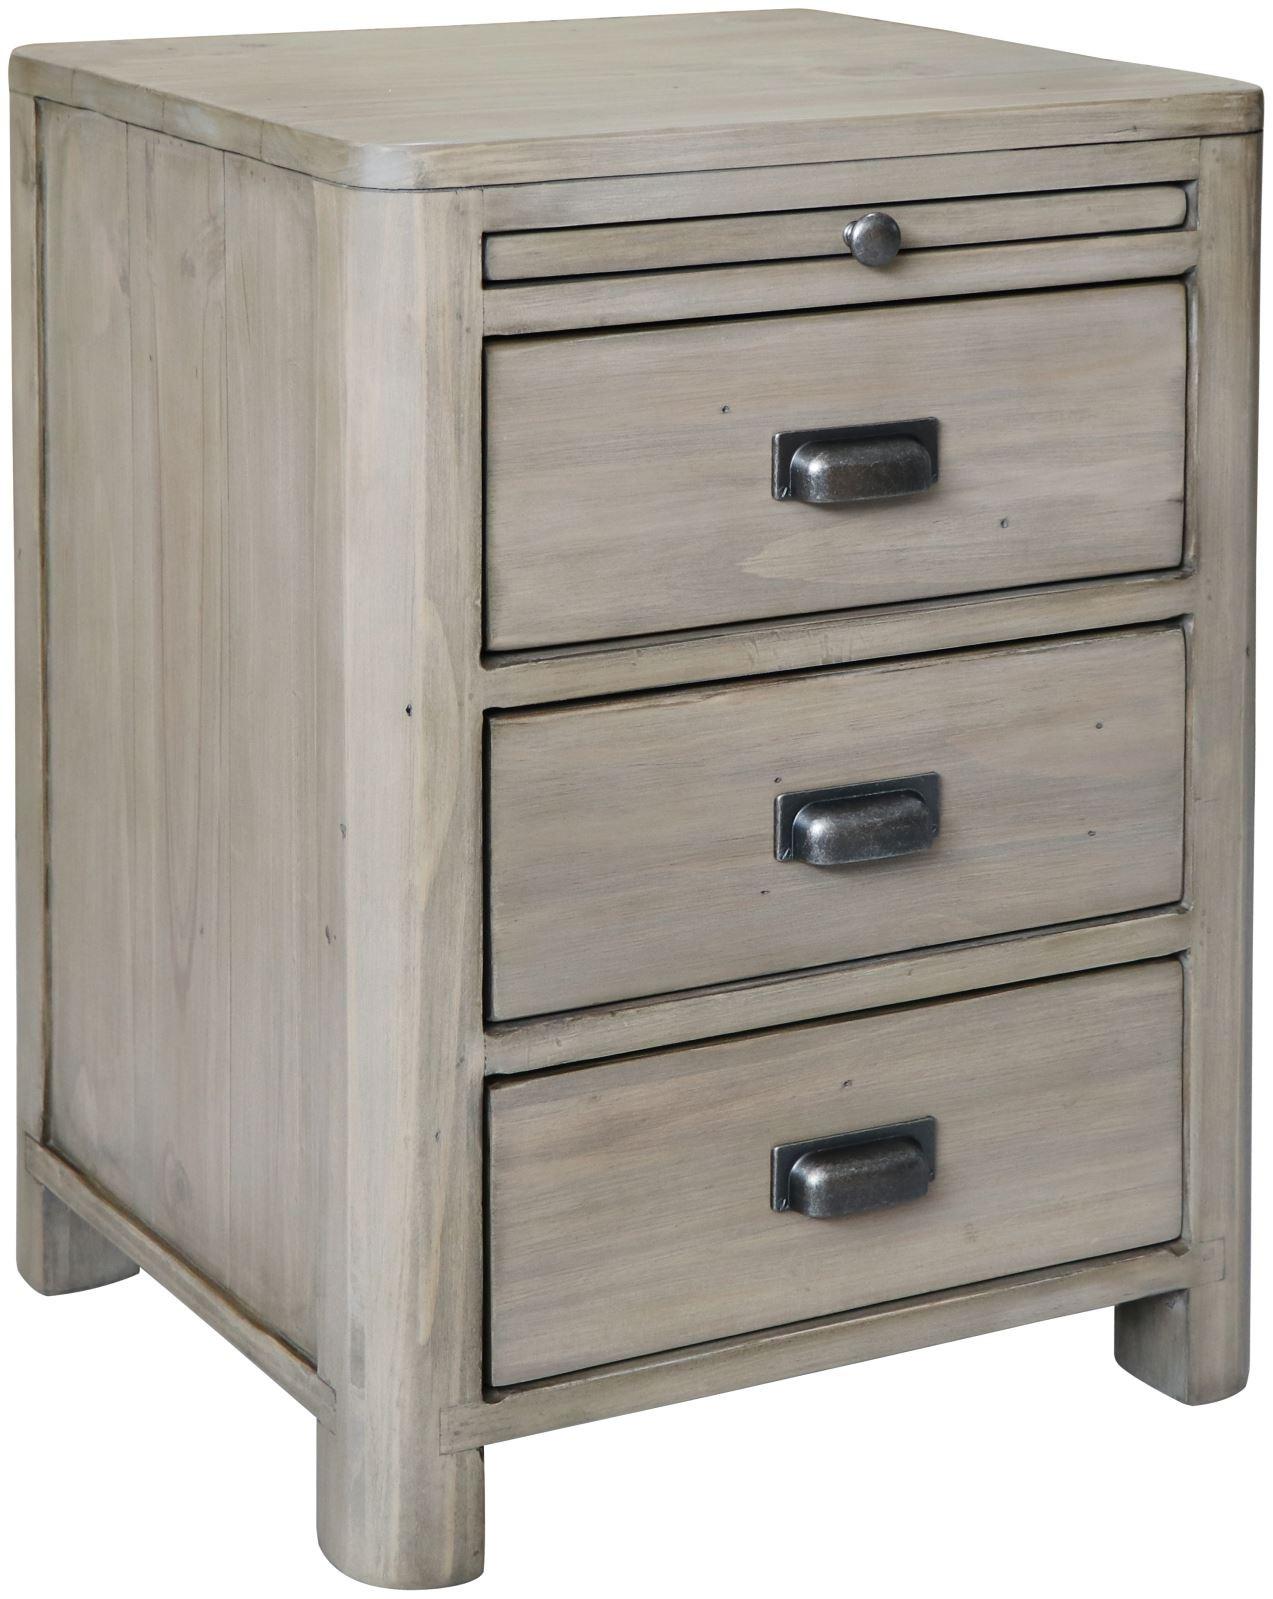 TENDE Reclaimed Pine Bedside Cabinet